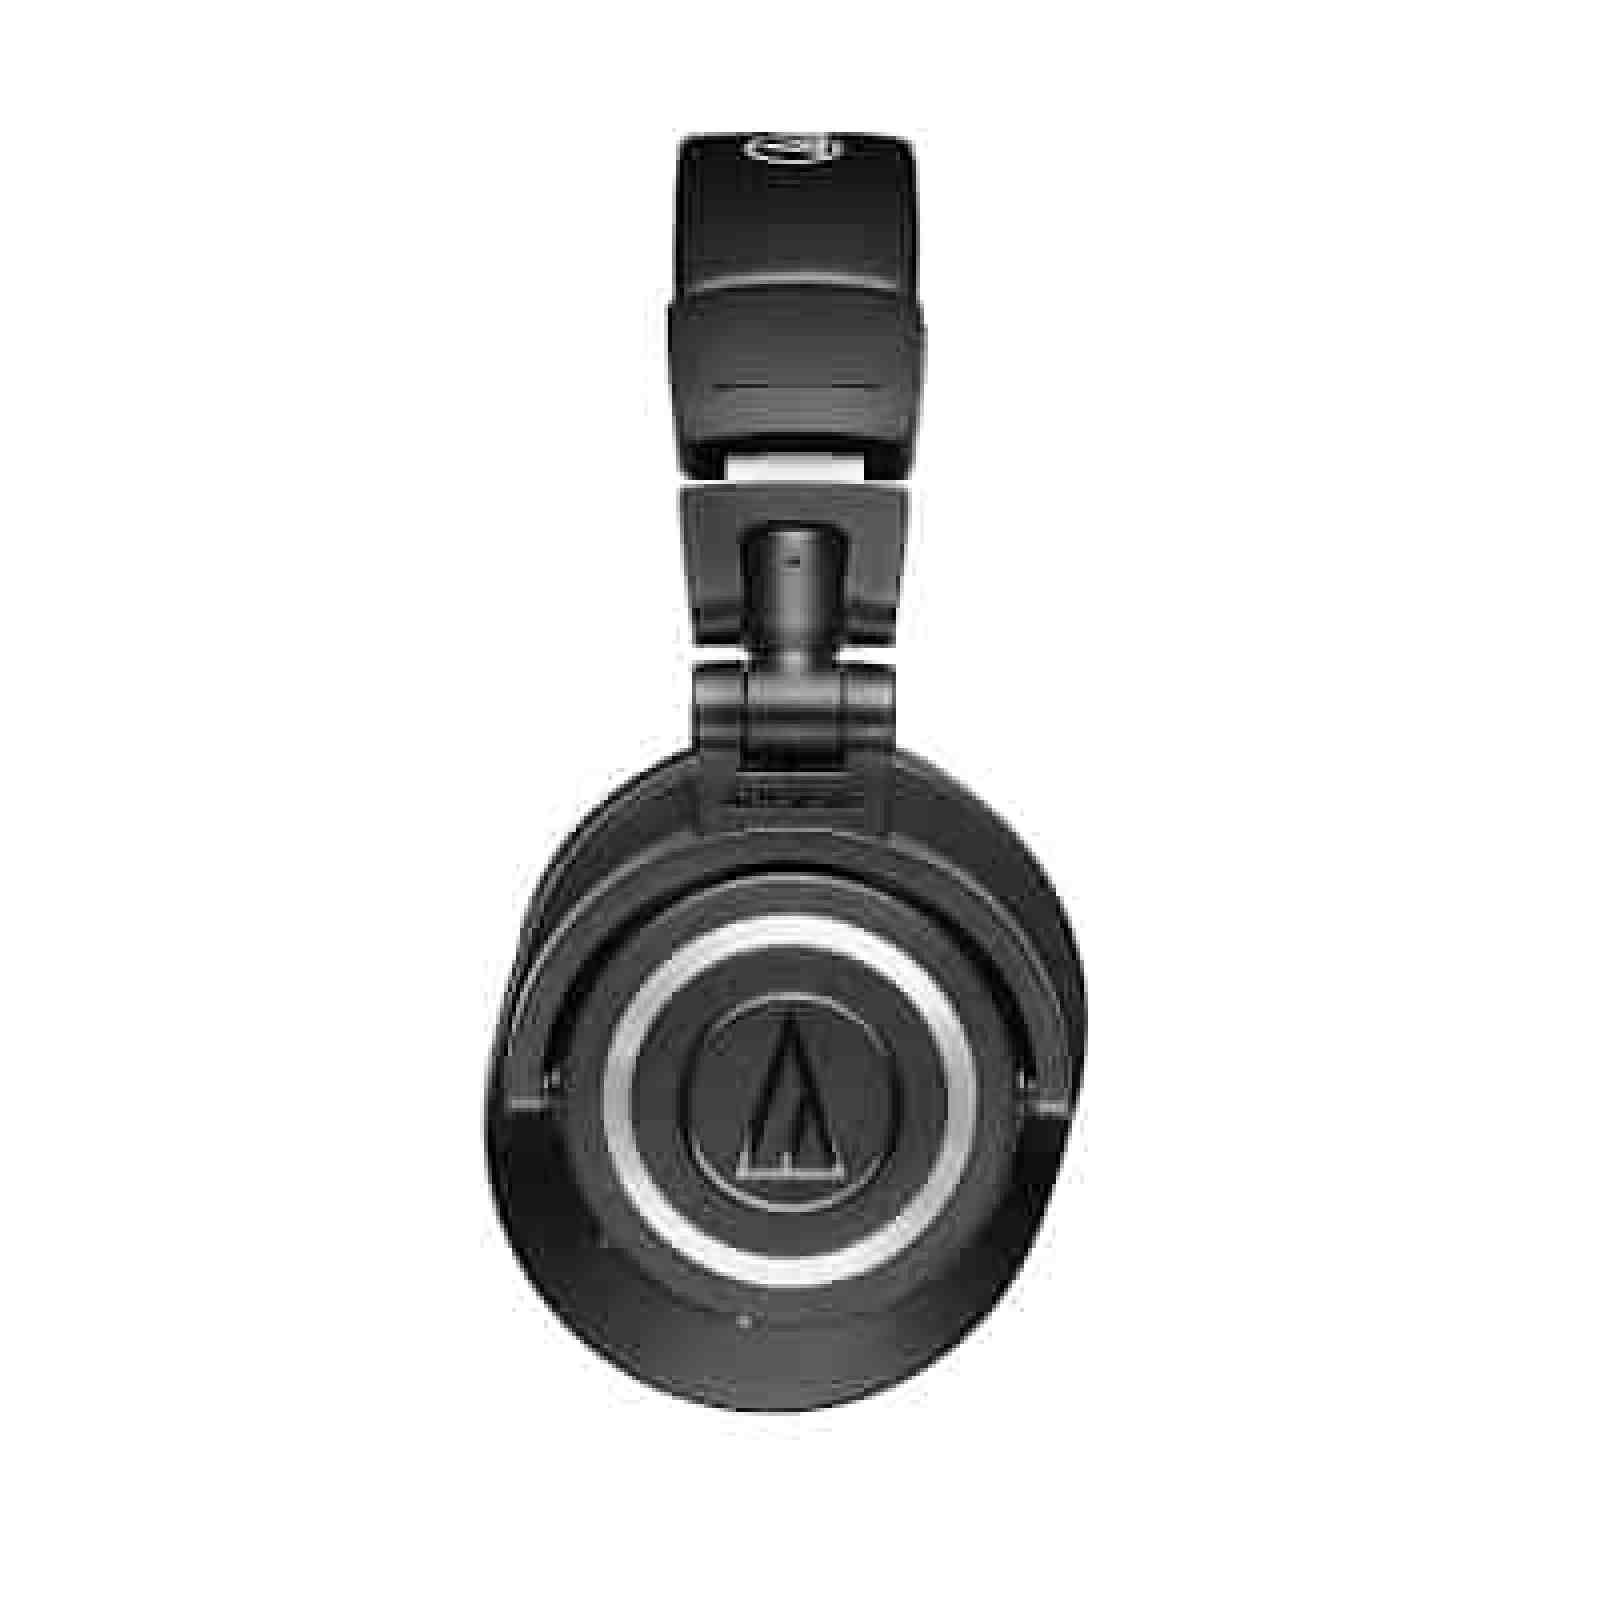 - ATH M50xBT 1 2 - Audio Technica นำหูฟังรุ่นยอดนิยม ATH-M50x มาทำใหม่ในรูปแบบไร้สาย เตรียมวางจำหน่ายในไทยราคา 7,690 บาท